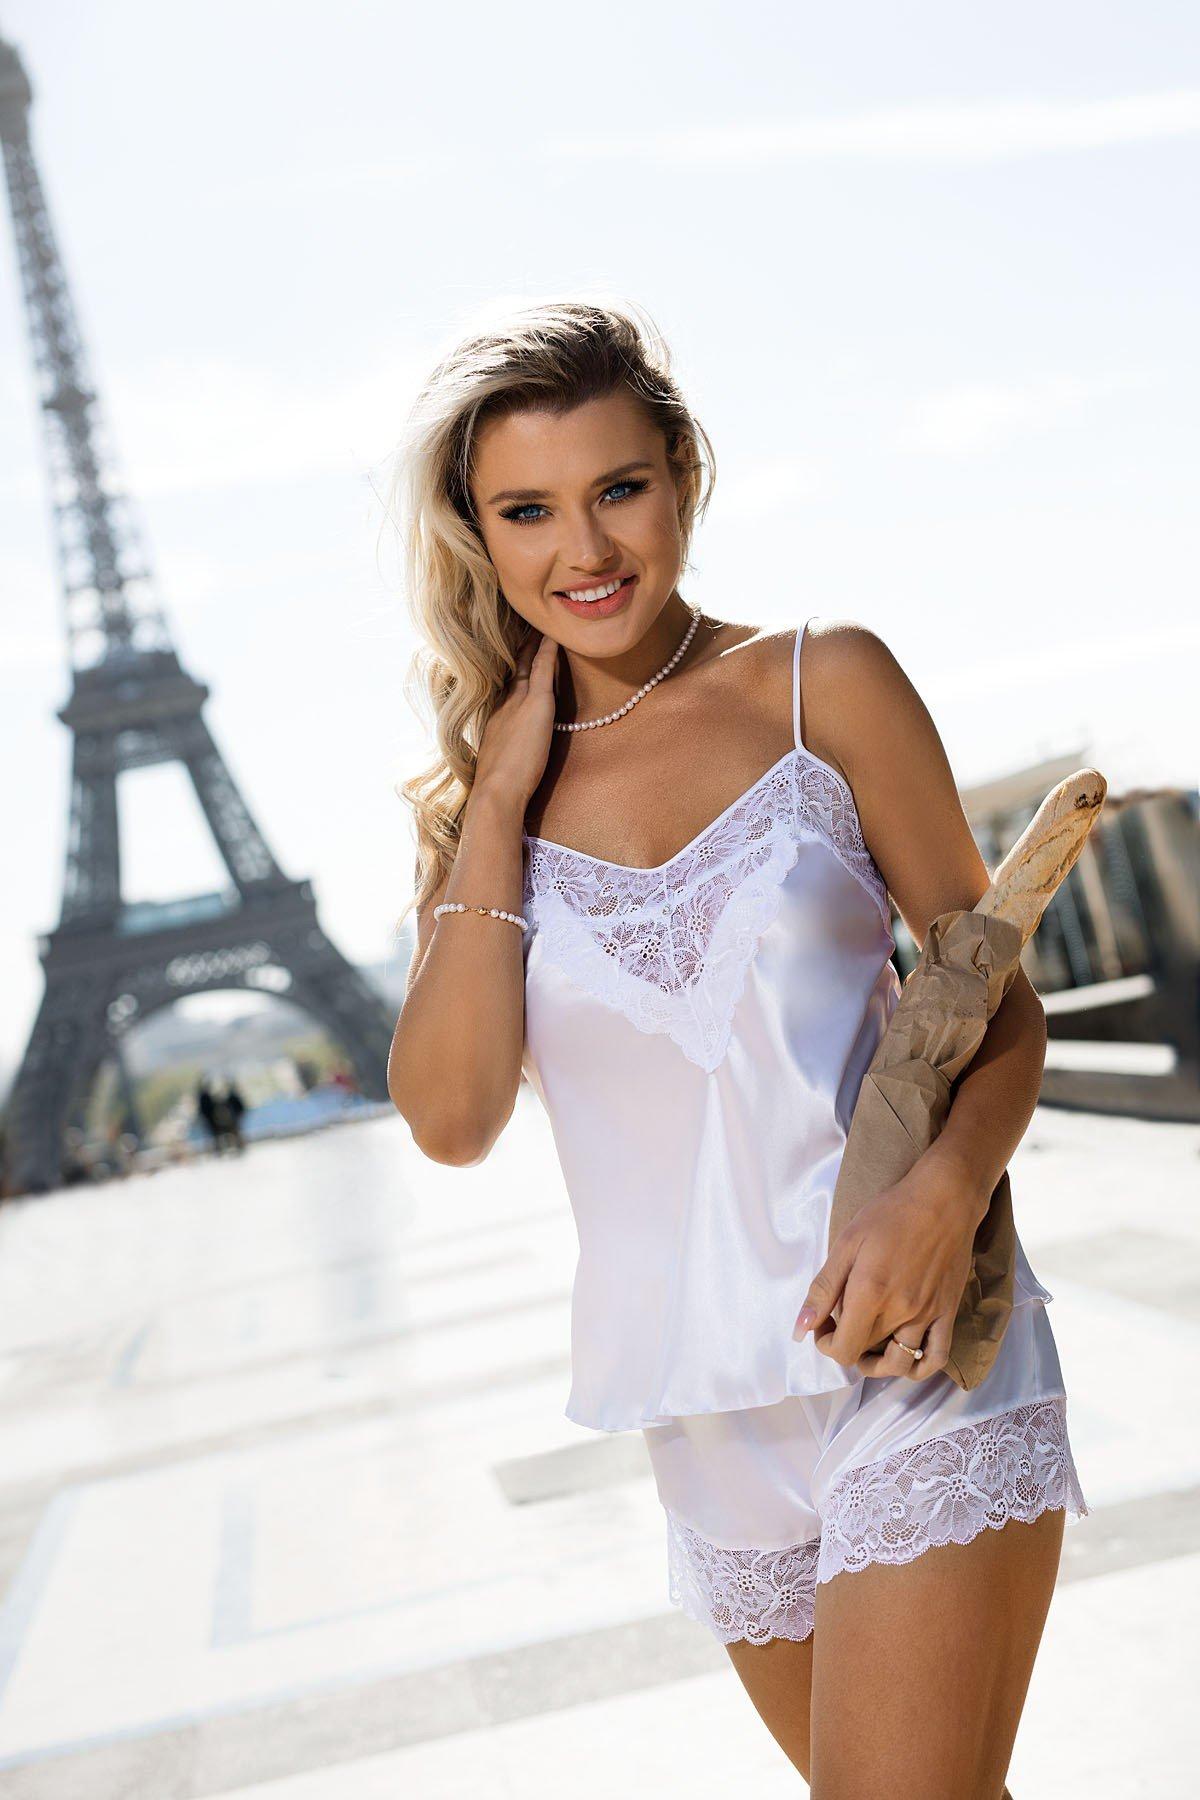 Biała koronkowa piżama Dkaren Cynthia